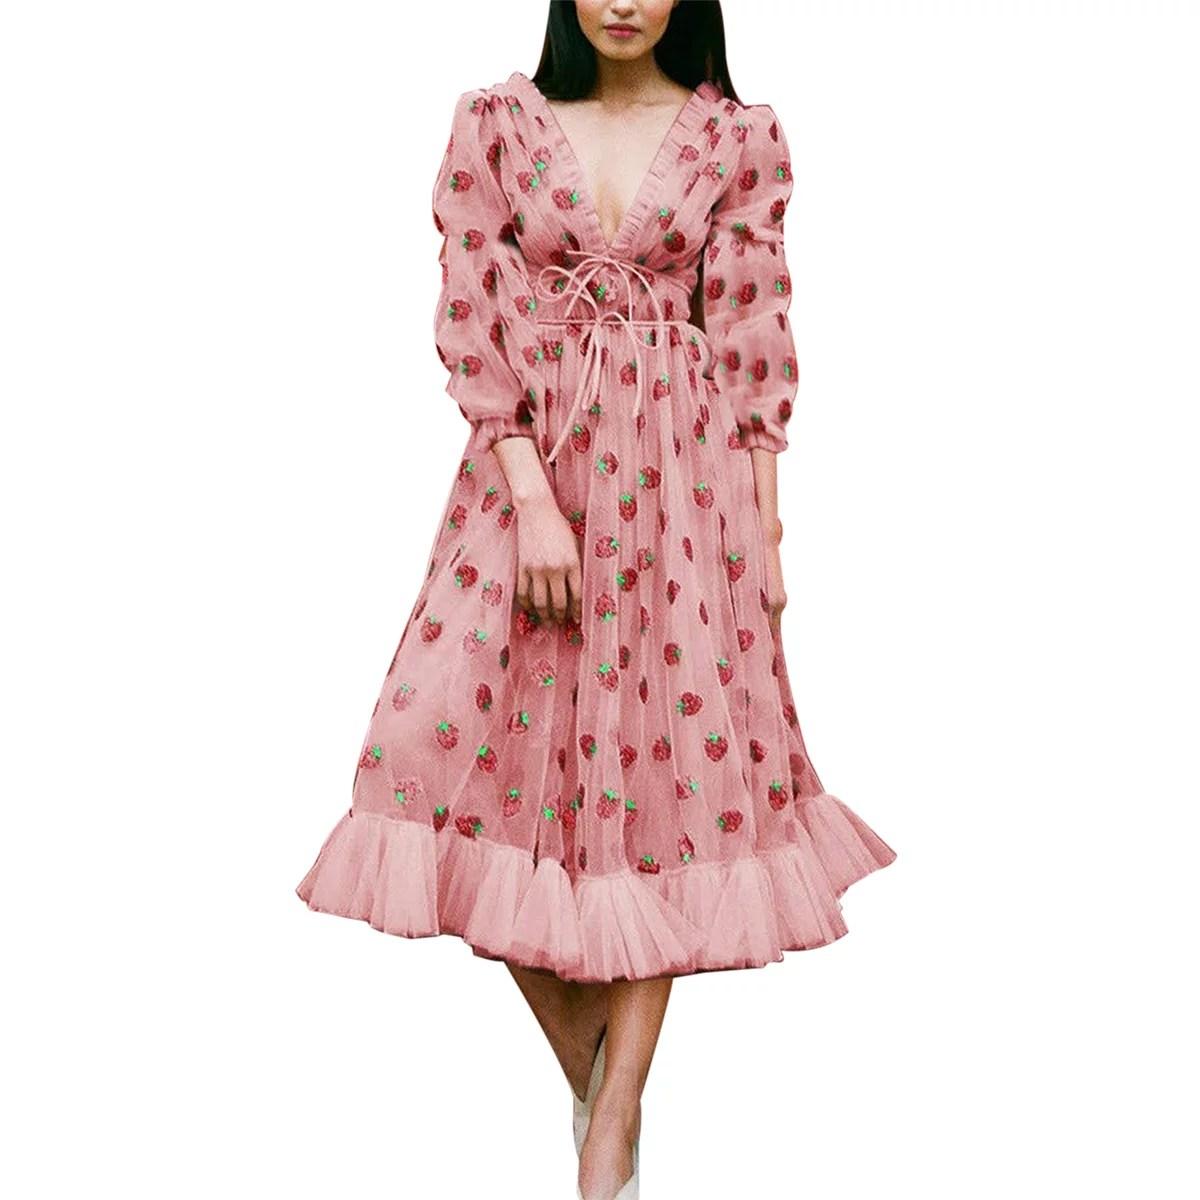 ducklingup women s fashion strawberry sequin dress summer short or long sleeve v neck slim fit a line dress